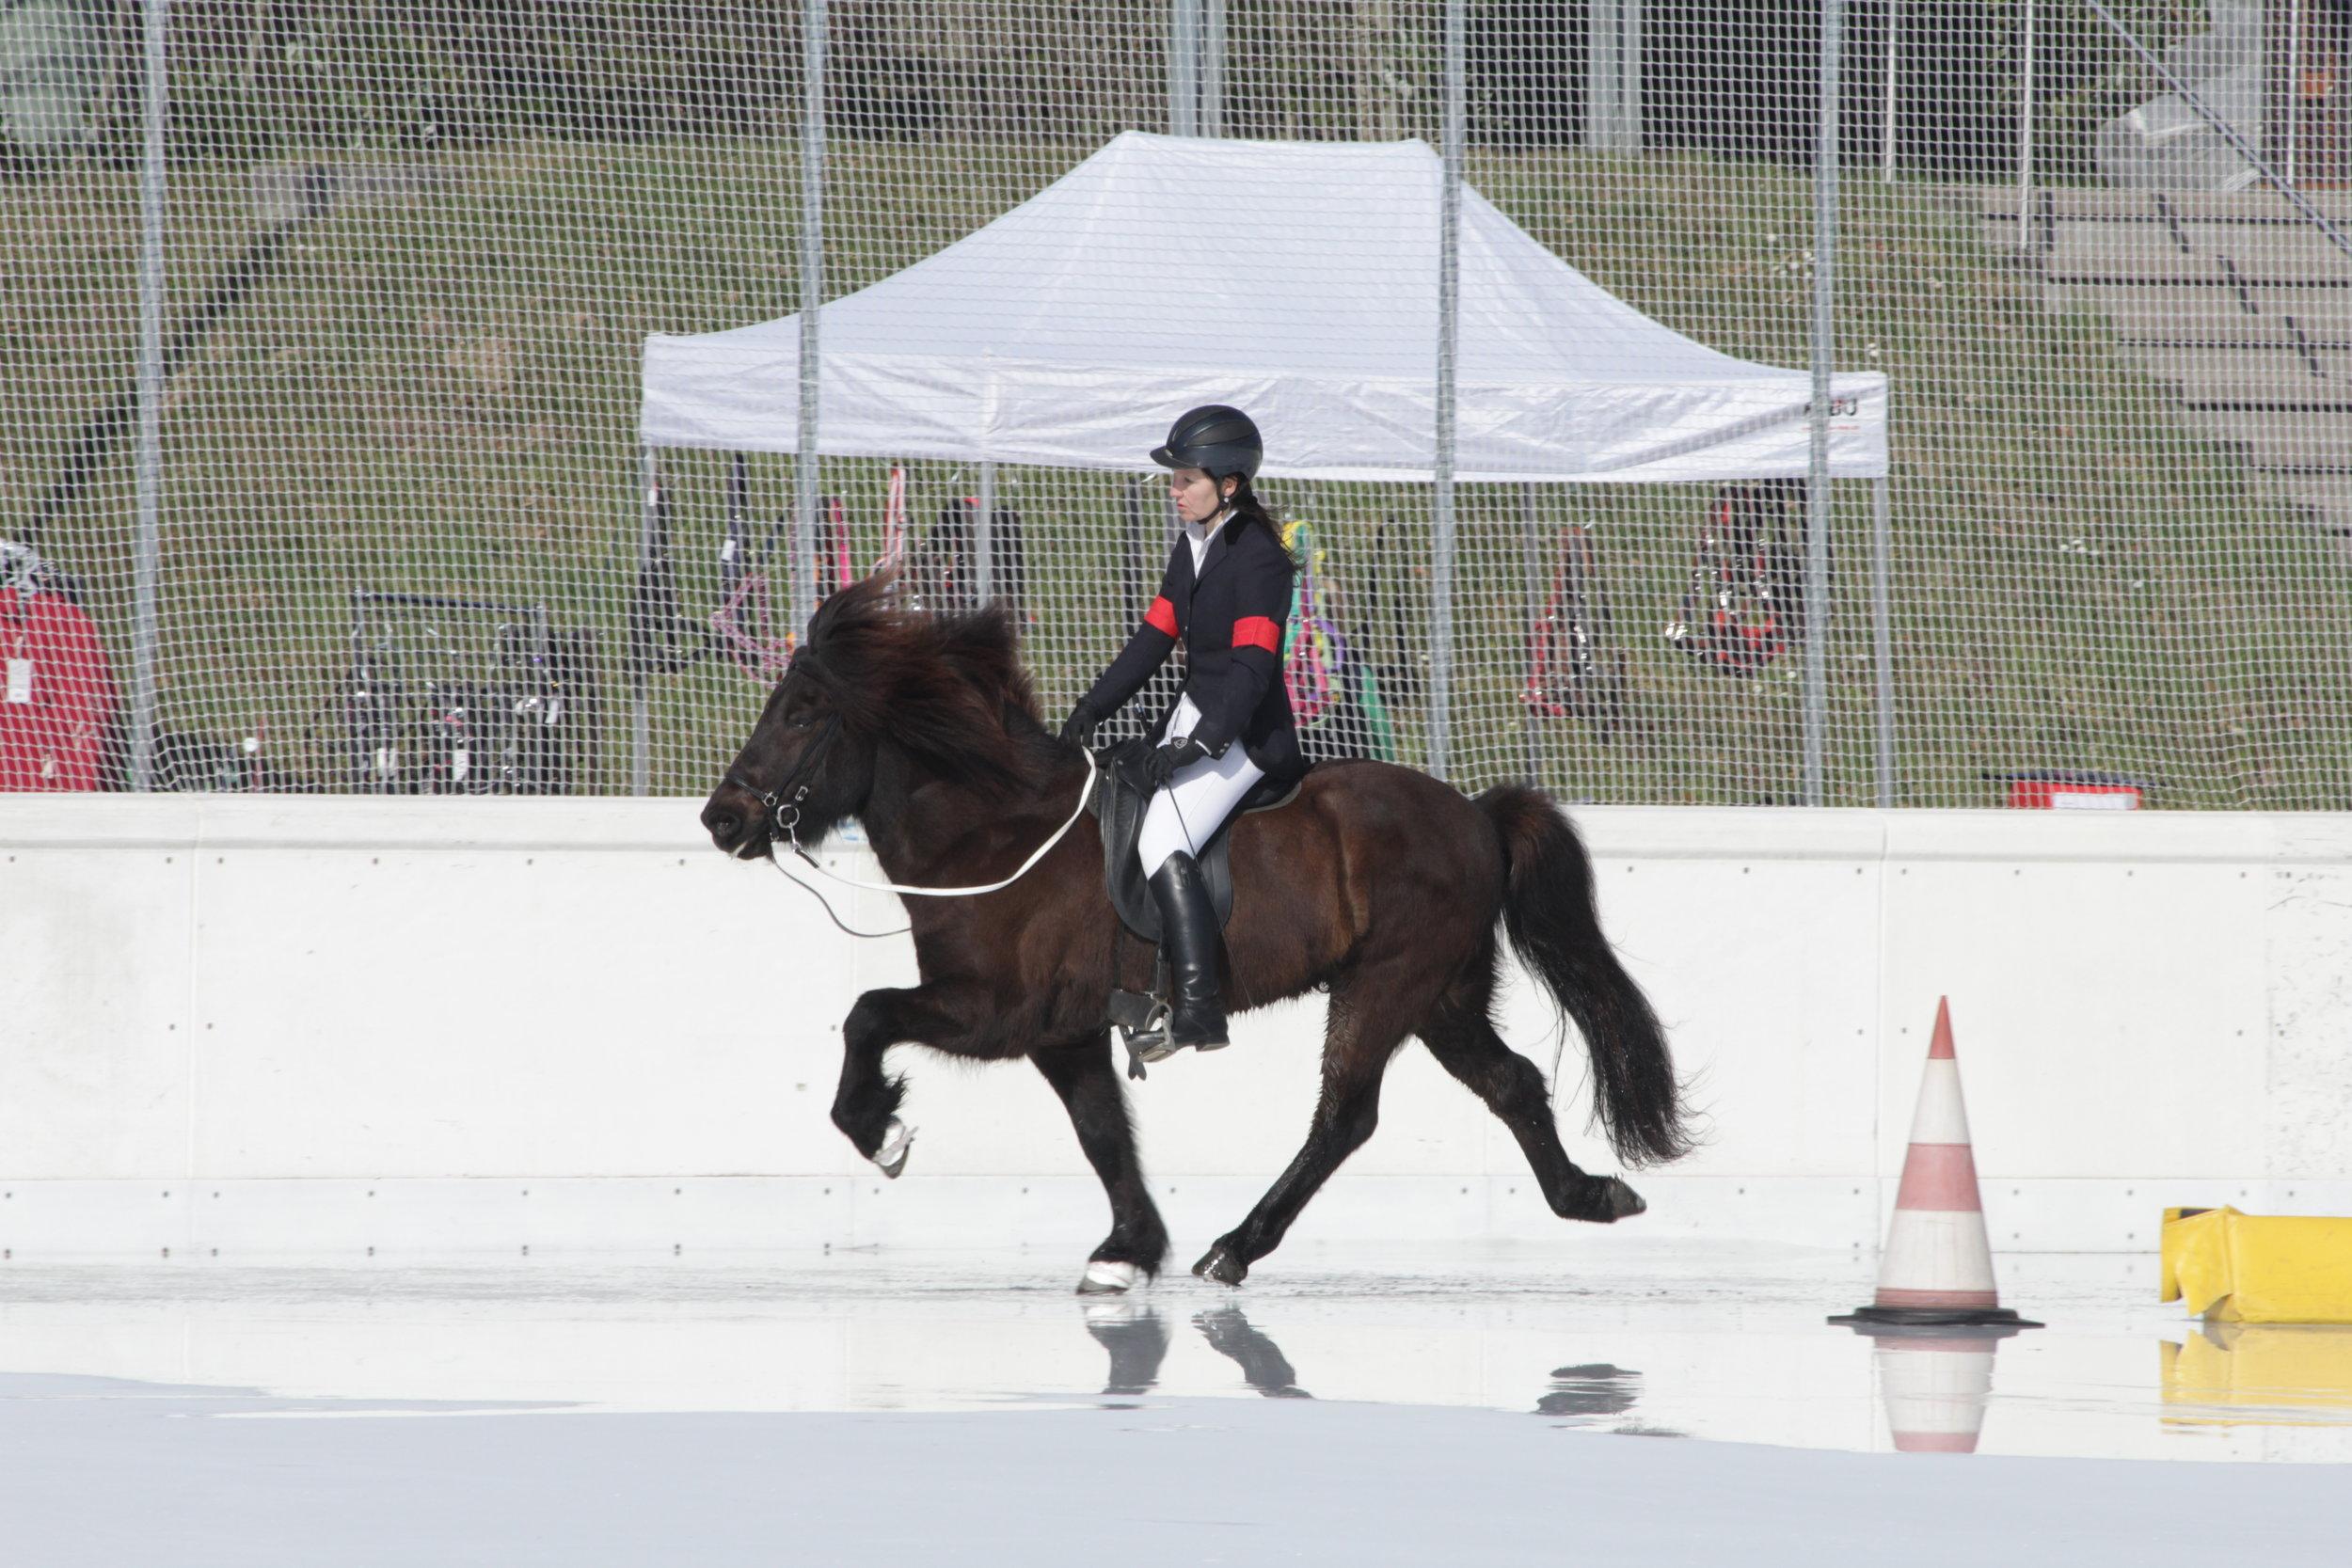 Dominique mit Valur auf dem Eis